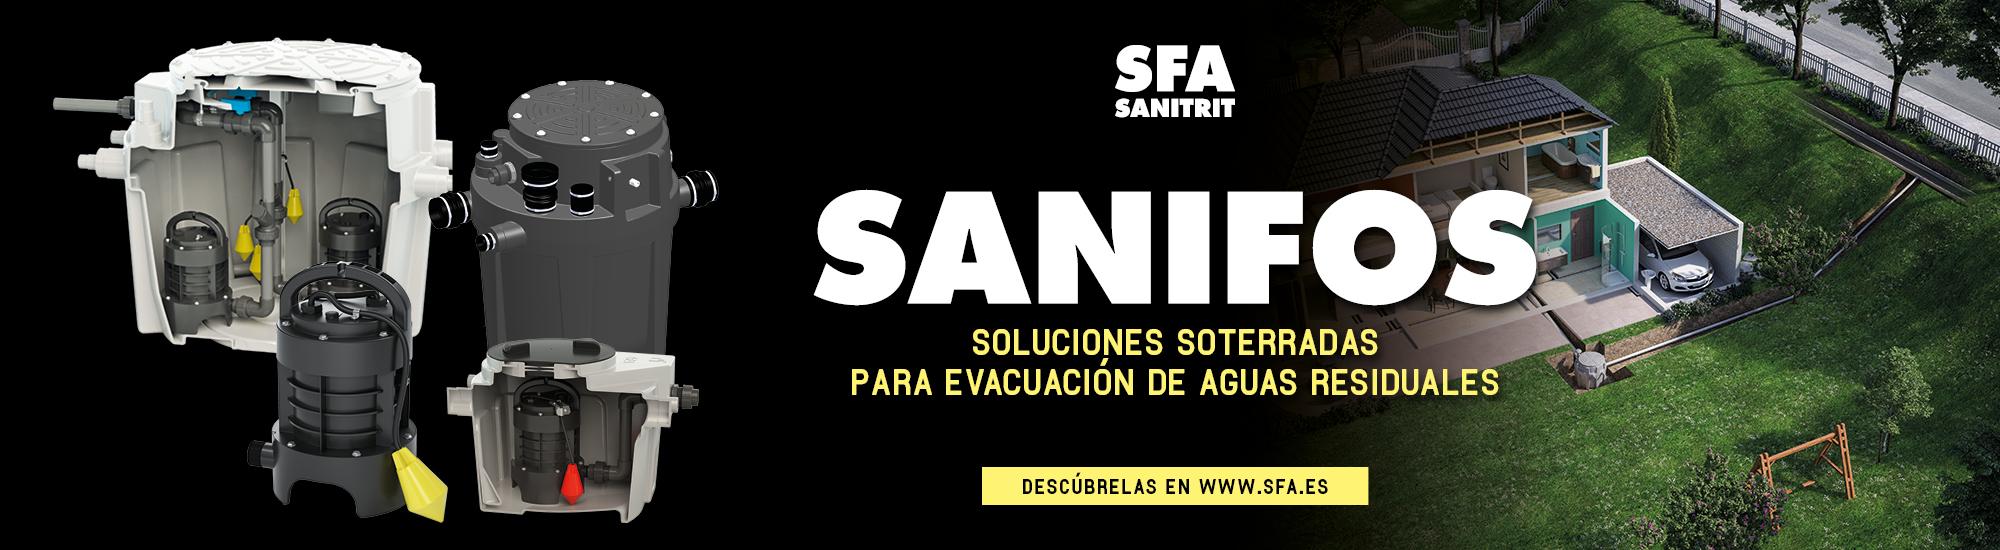 Banner SFA Diciembre19